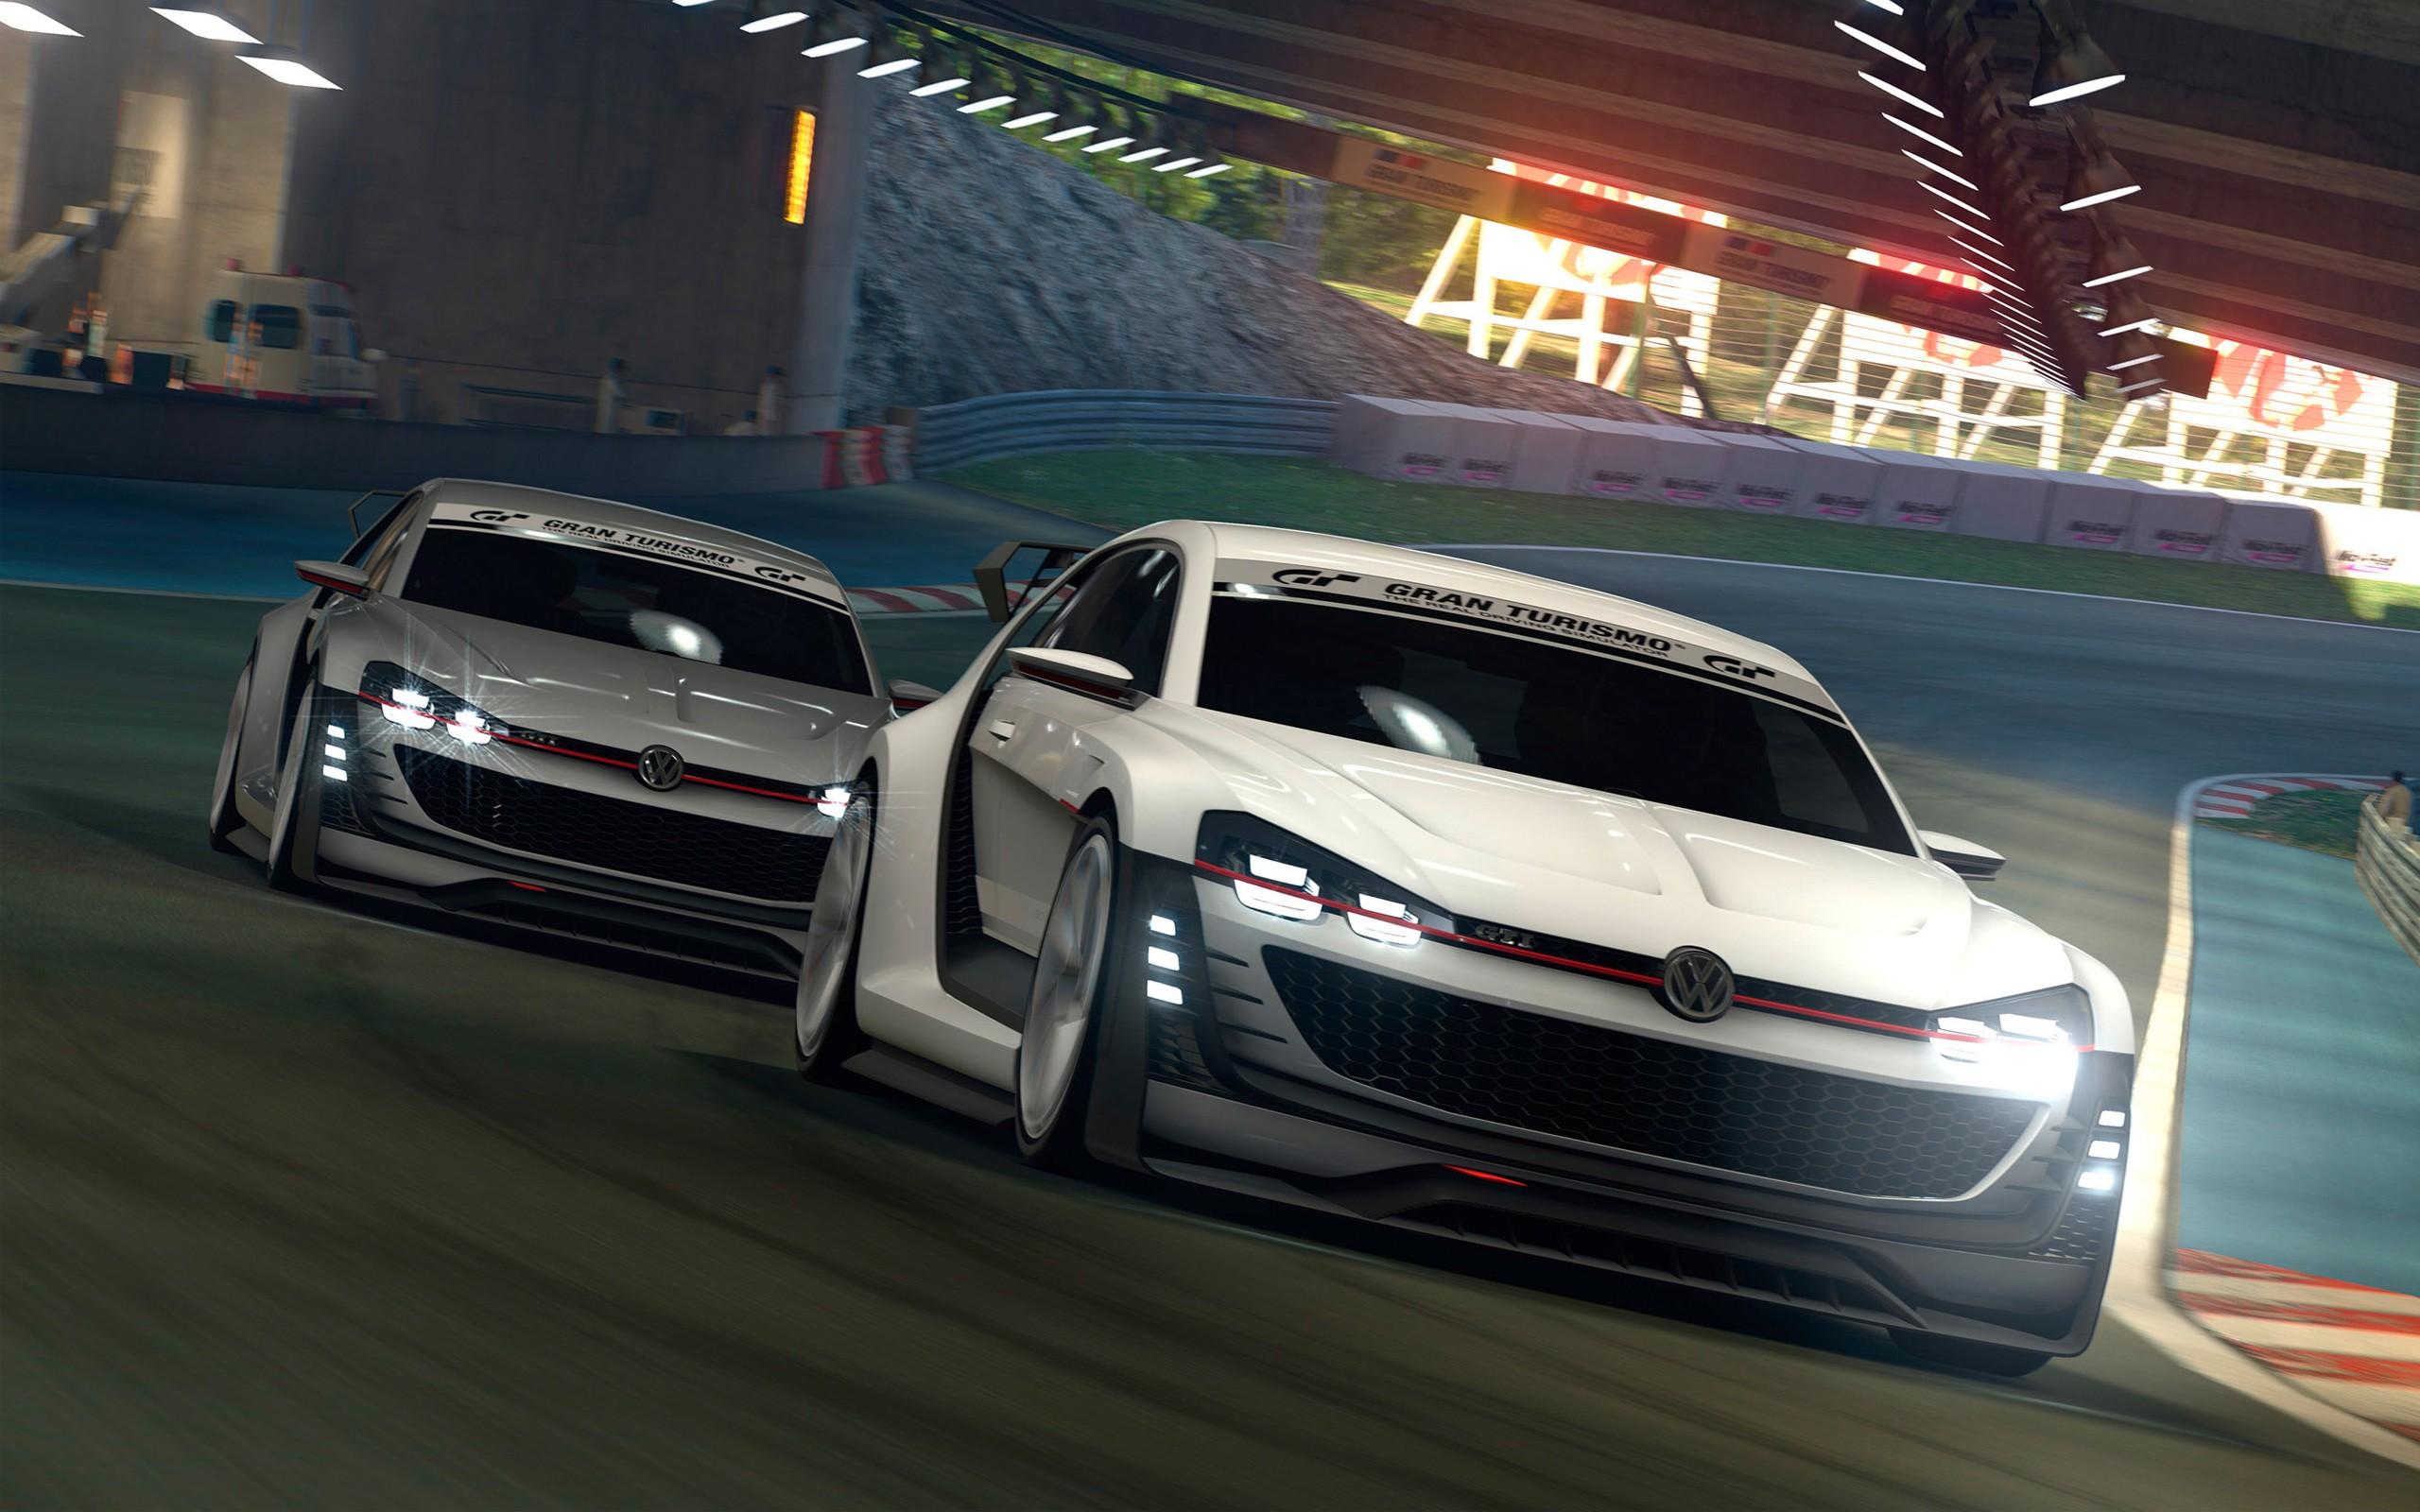 Vw Beetle Iphone Wallpaper 2015 Volkswagen Gti Supersport Vision Gran Turismo Concept